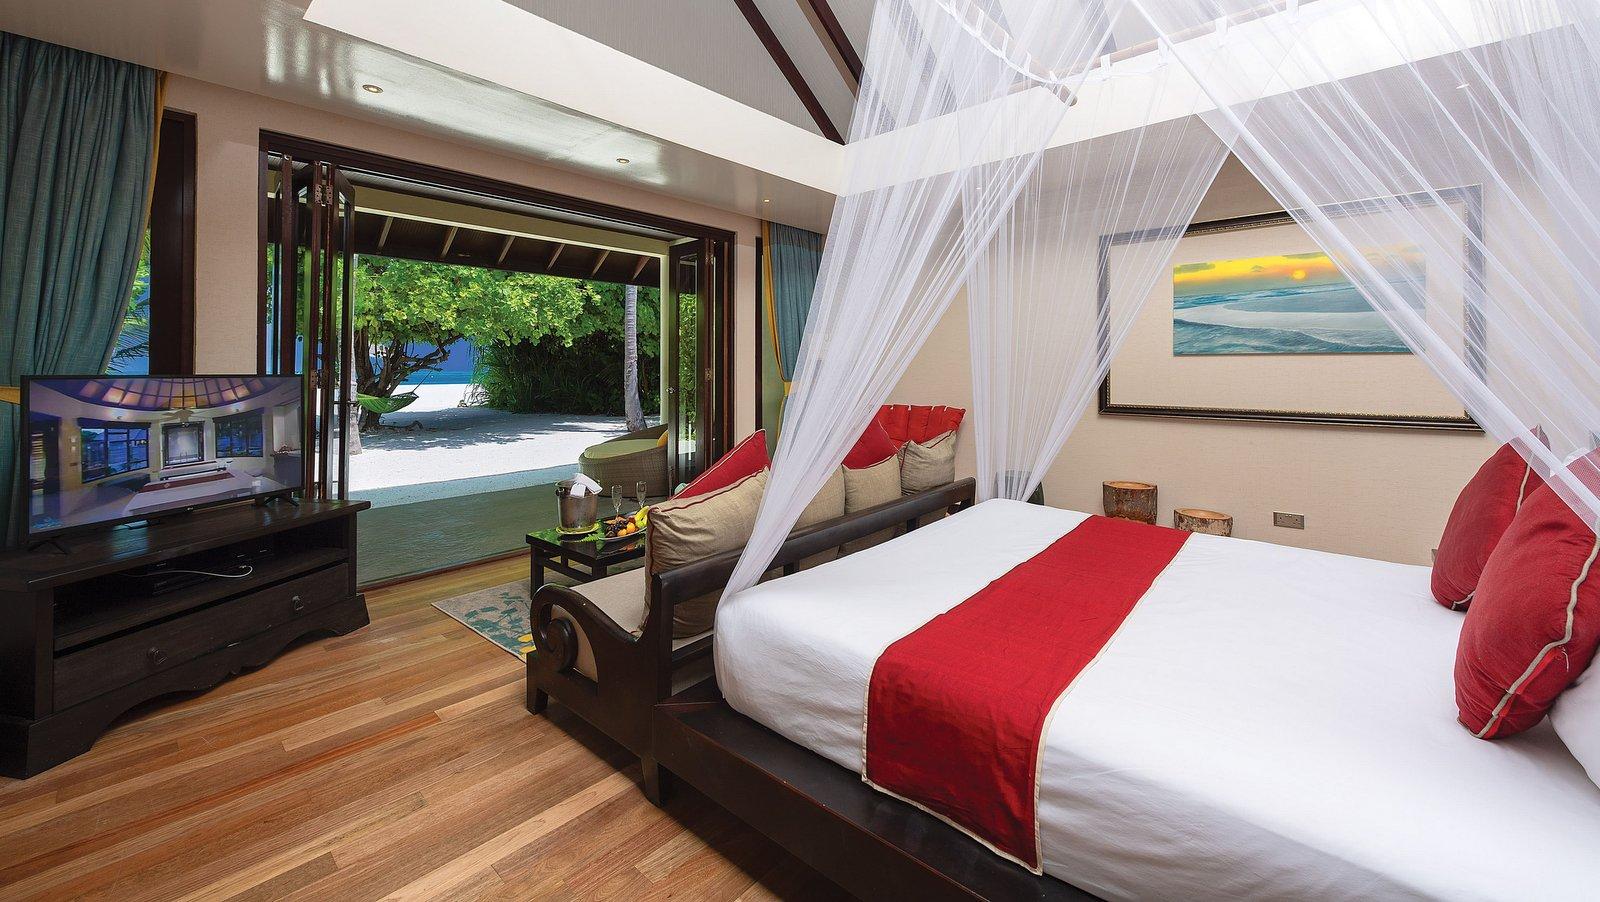 Мальдивы, отель Atmosphere Kanifushi Maldives, номер Sunset Deluxe Beach Villa